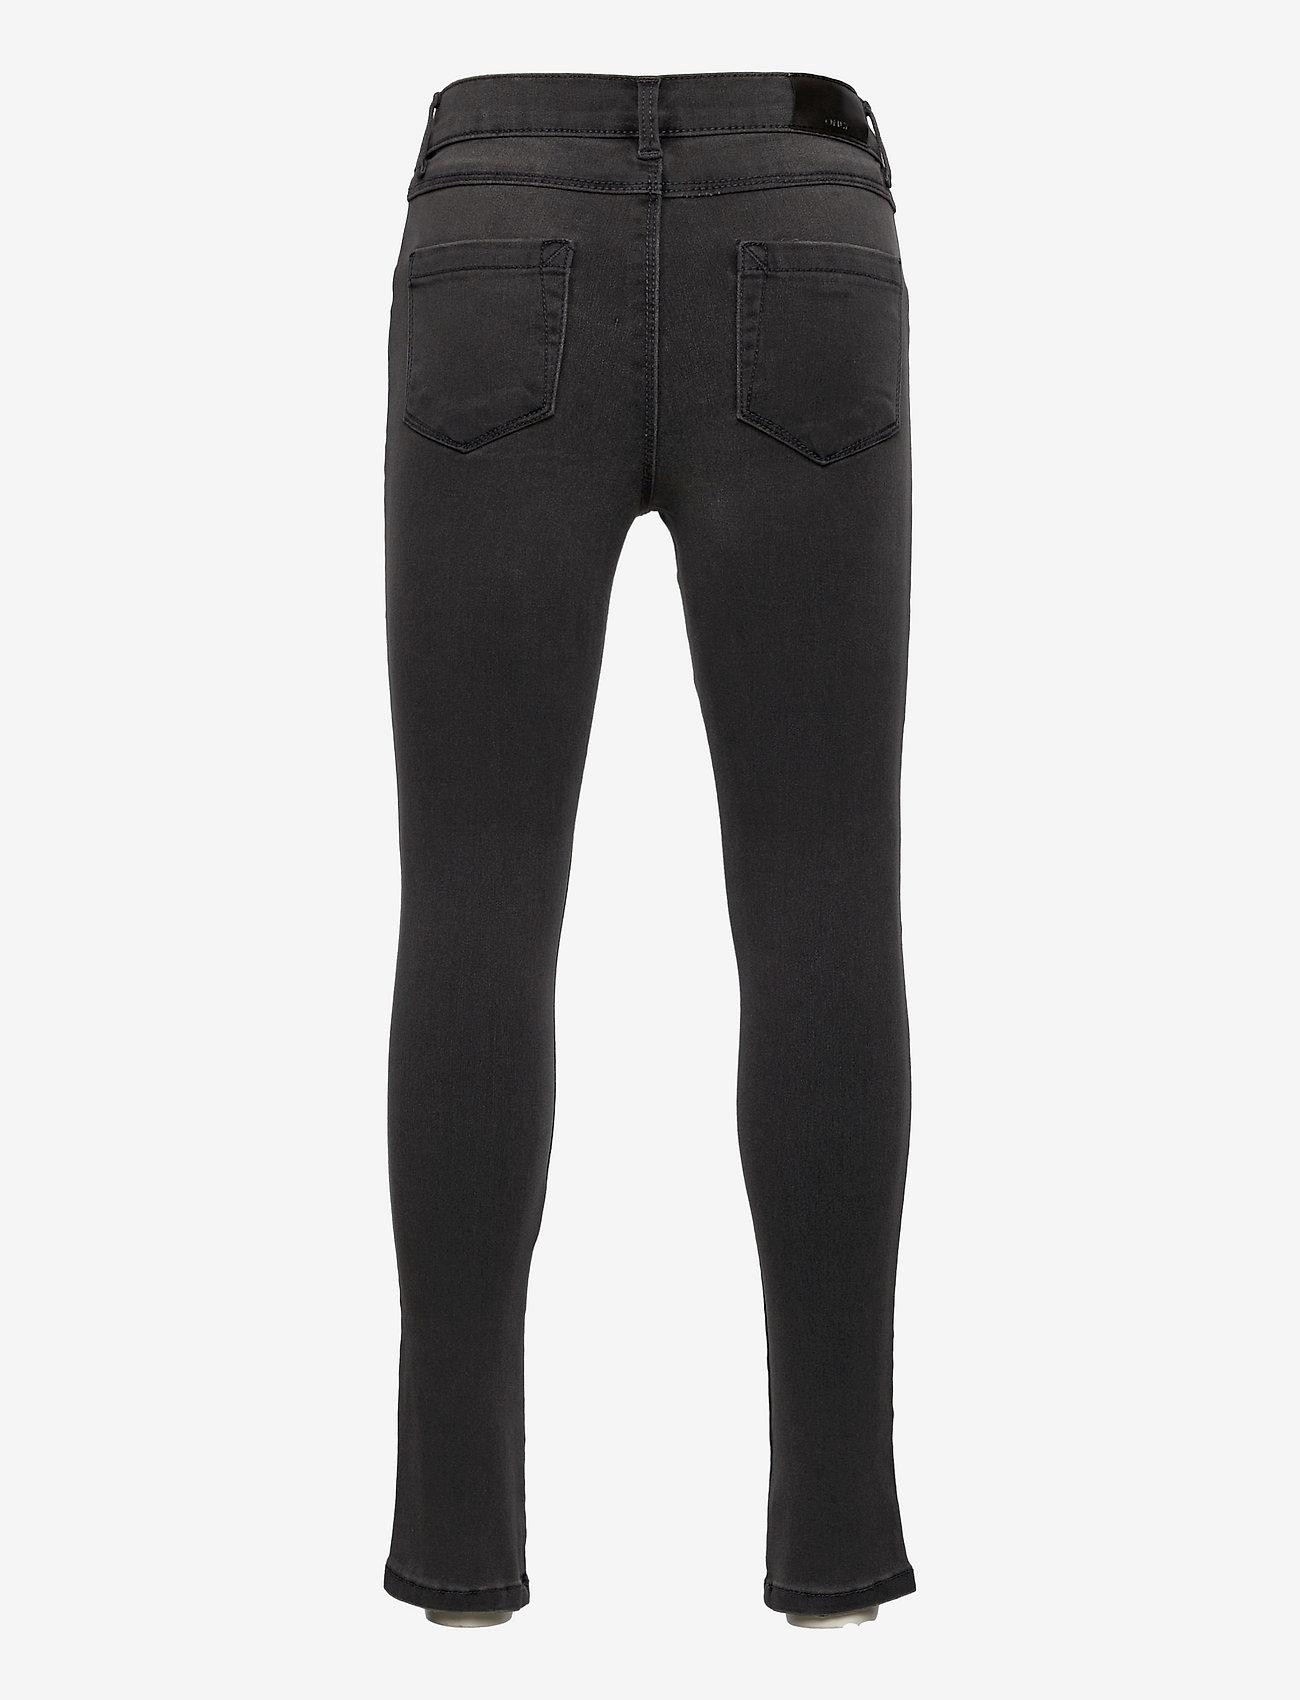 Kids Only - KONROYAL LIFE REG SKINNY BJ312 - jeans - dark grey denim - 1